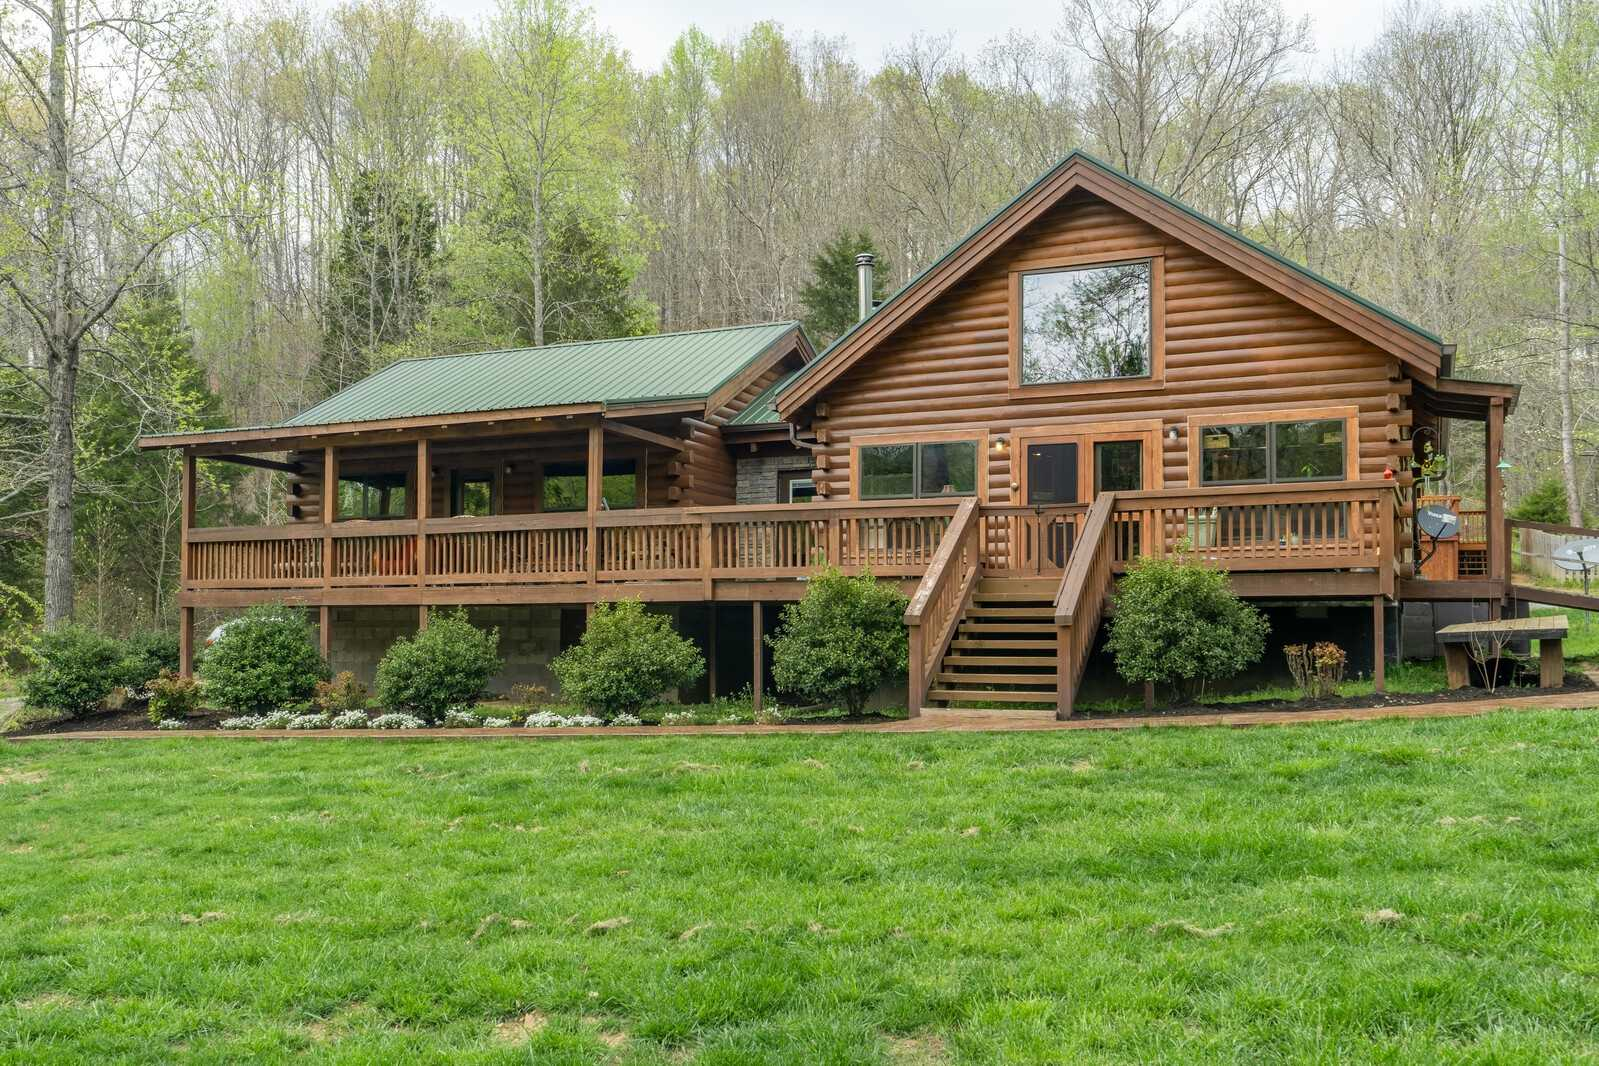 $720,000 - 4Br/3Ba -  for Sale in Jim Sisco Co Property, Goodlettsville